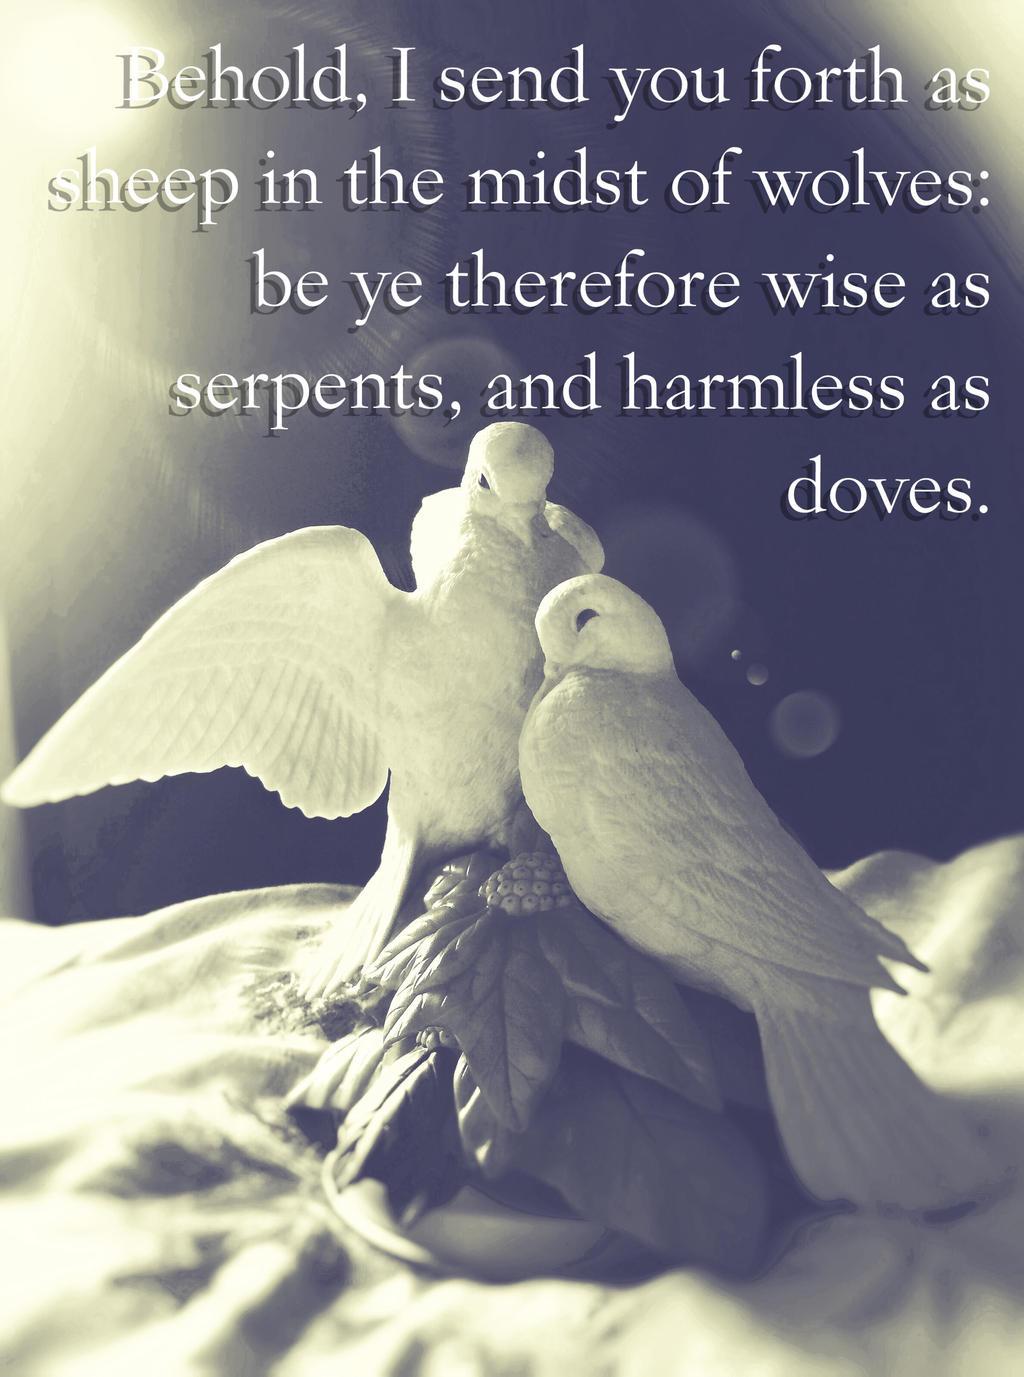 Matthew 10:16 by Tsukichan2622 on DeviantArt